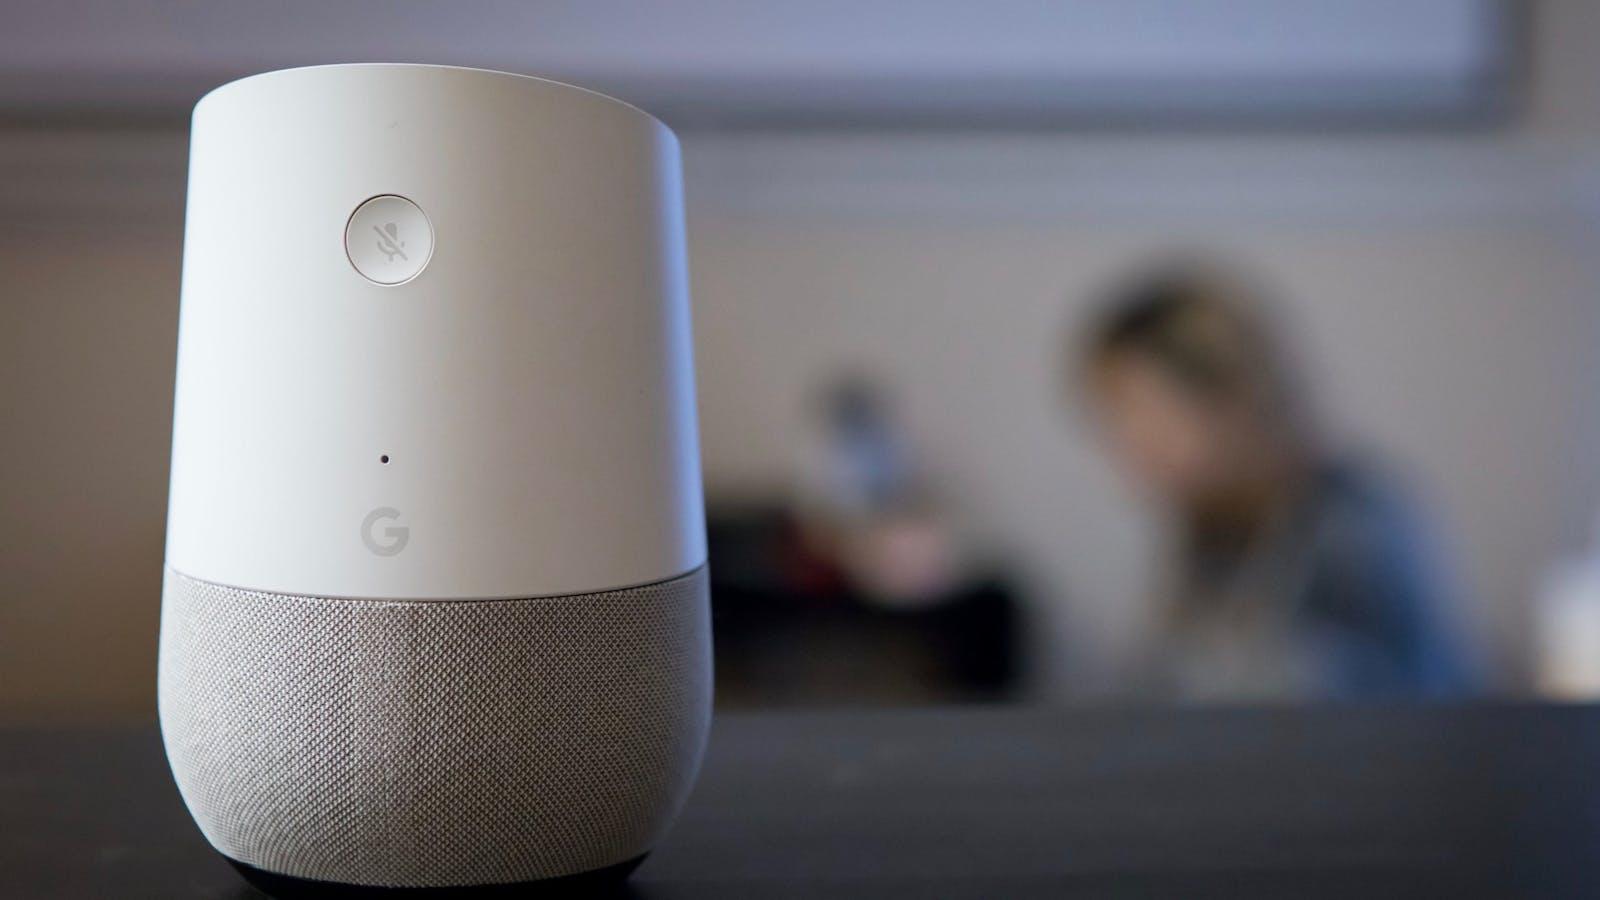 A Google Home speaker. Photo: AP